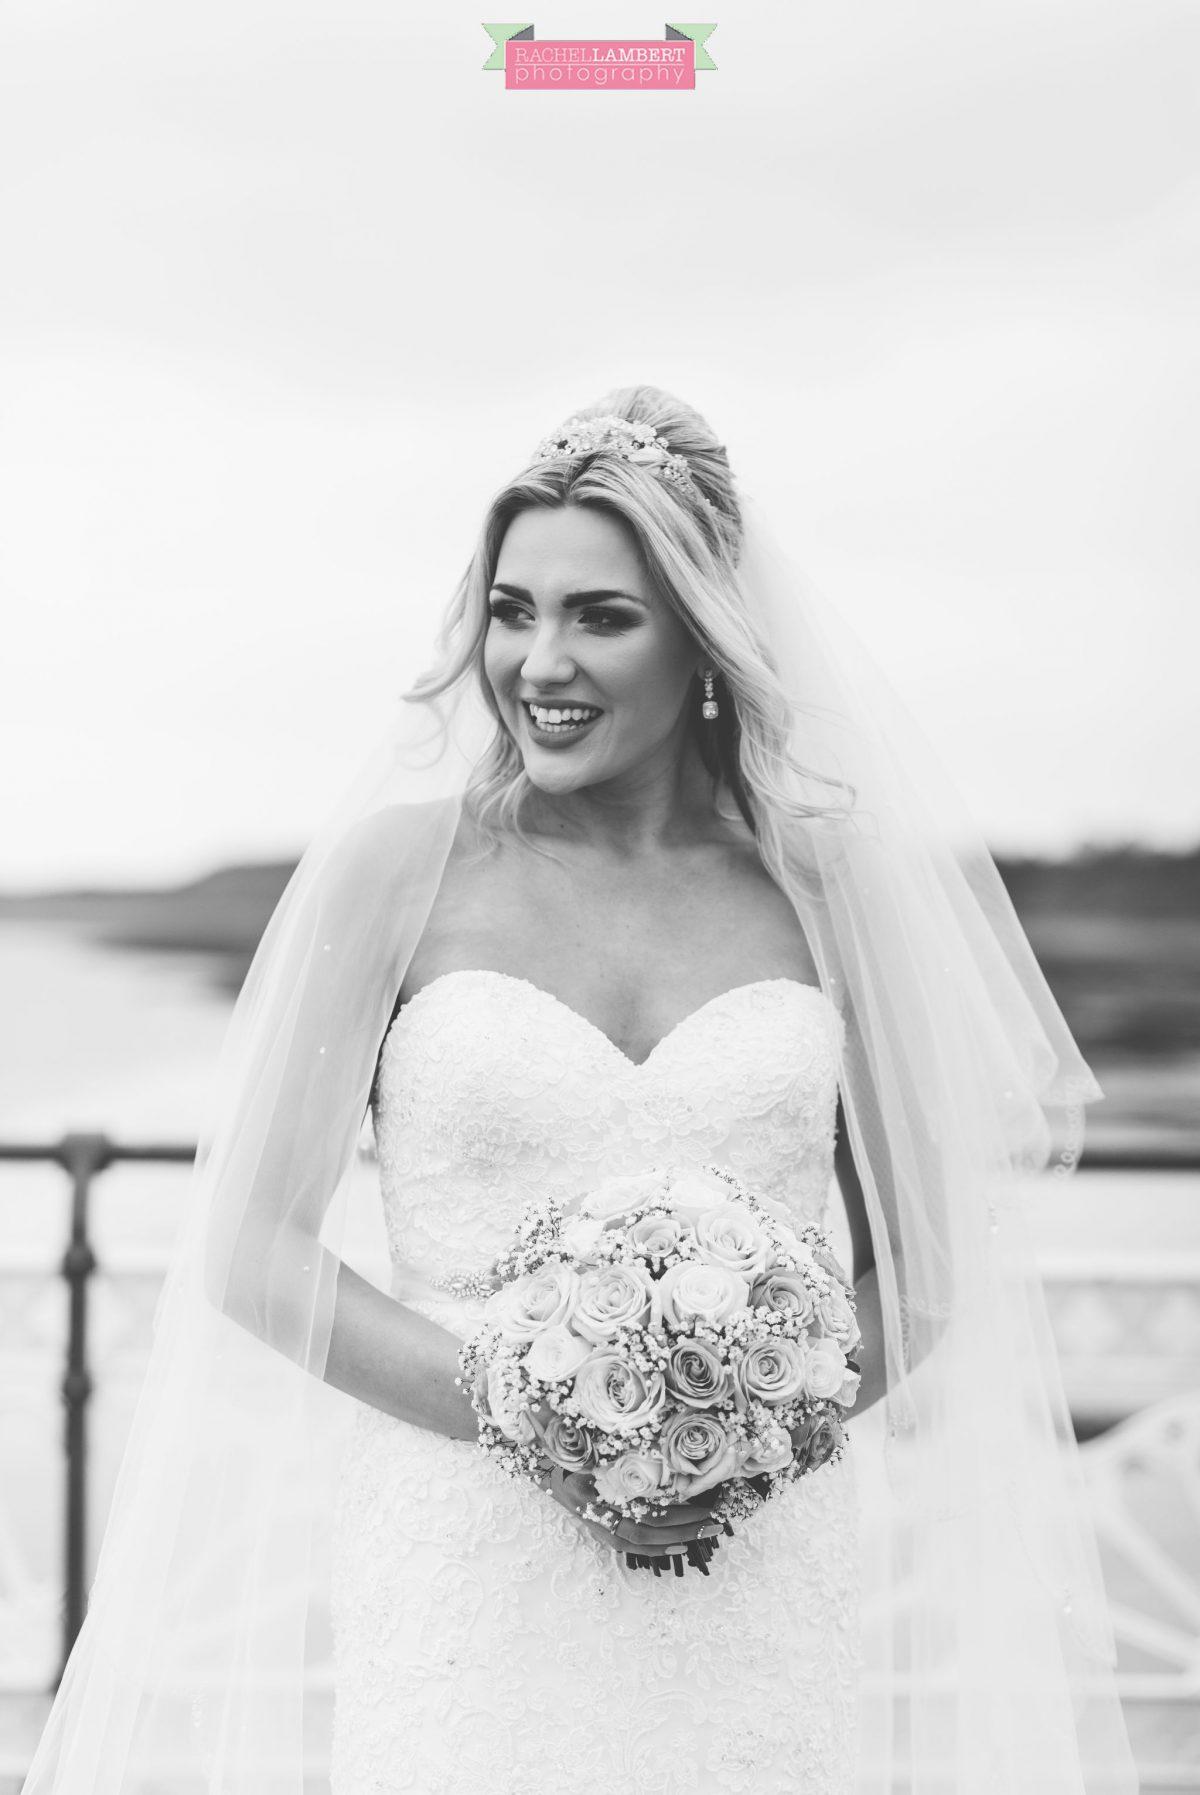 rachel lambert photography bride penarth pier